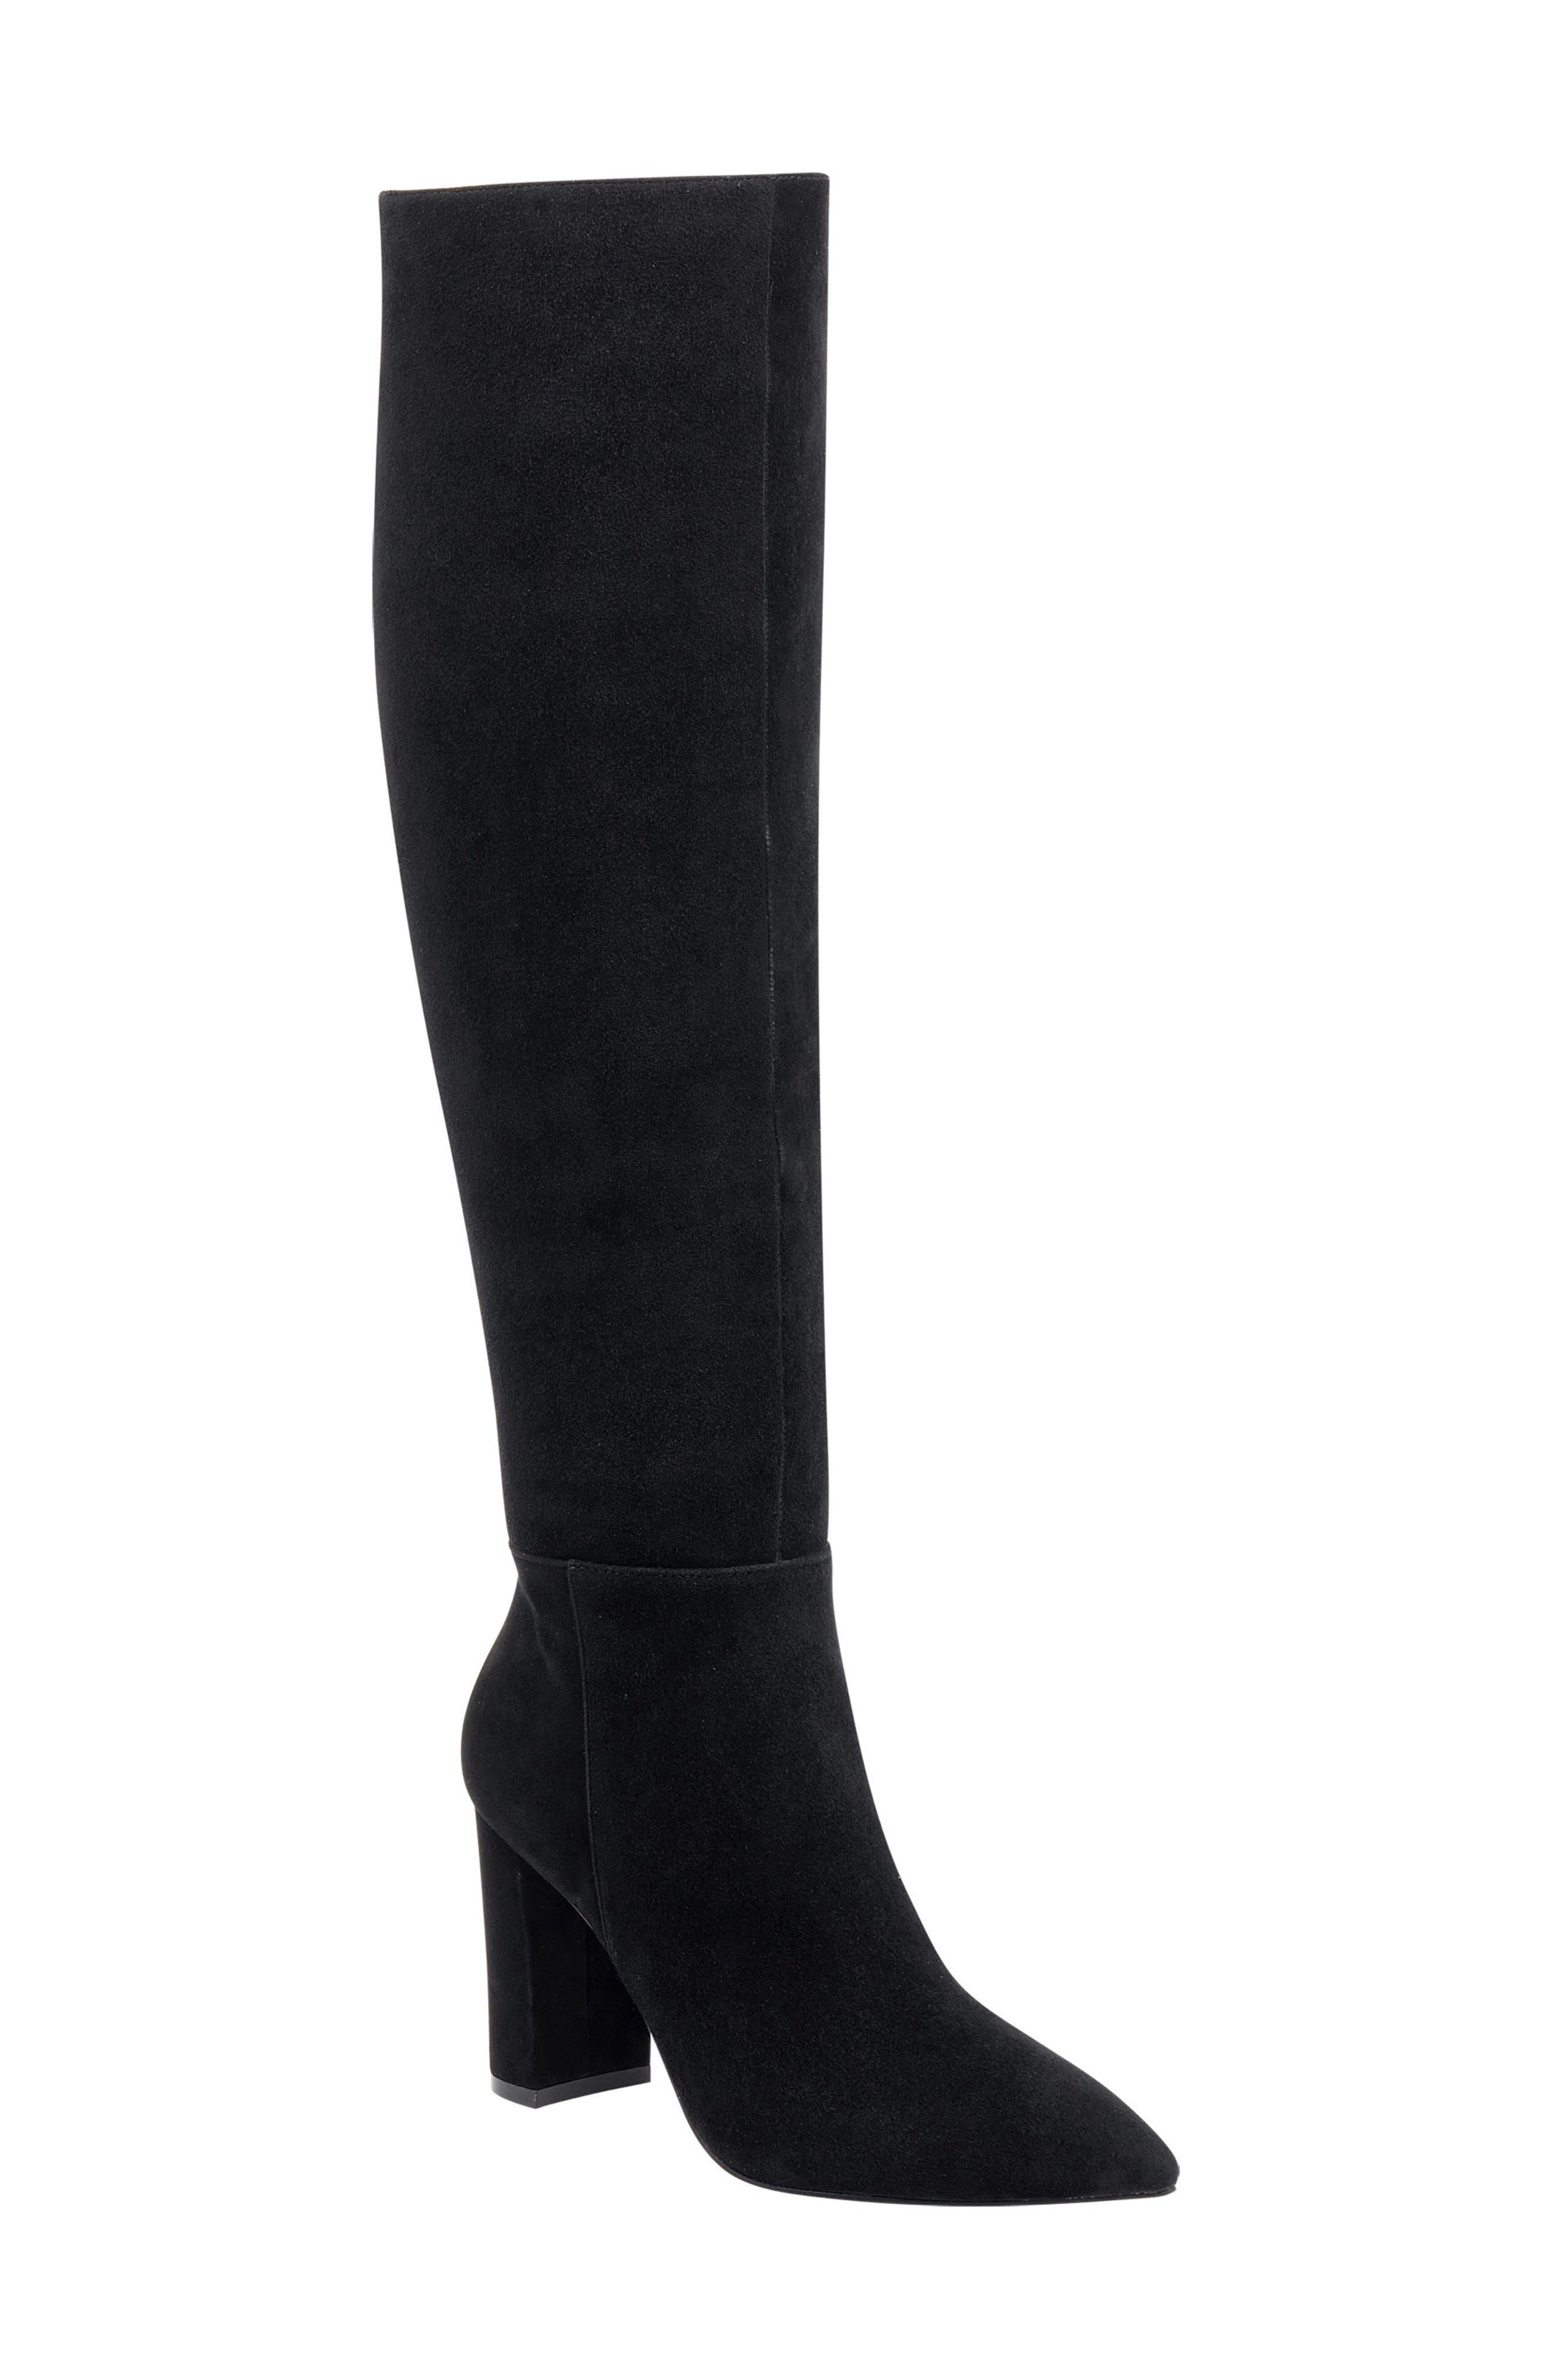 Ulana Knee High Boot,                             Main thumbnail 1, color,                             BLACK SUEDE